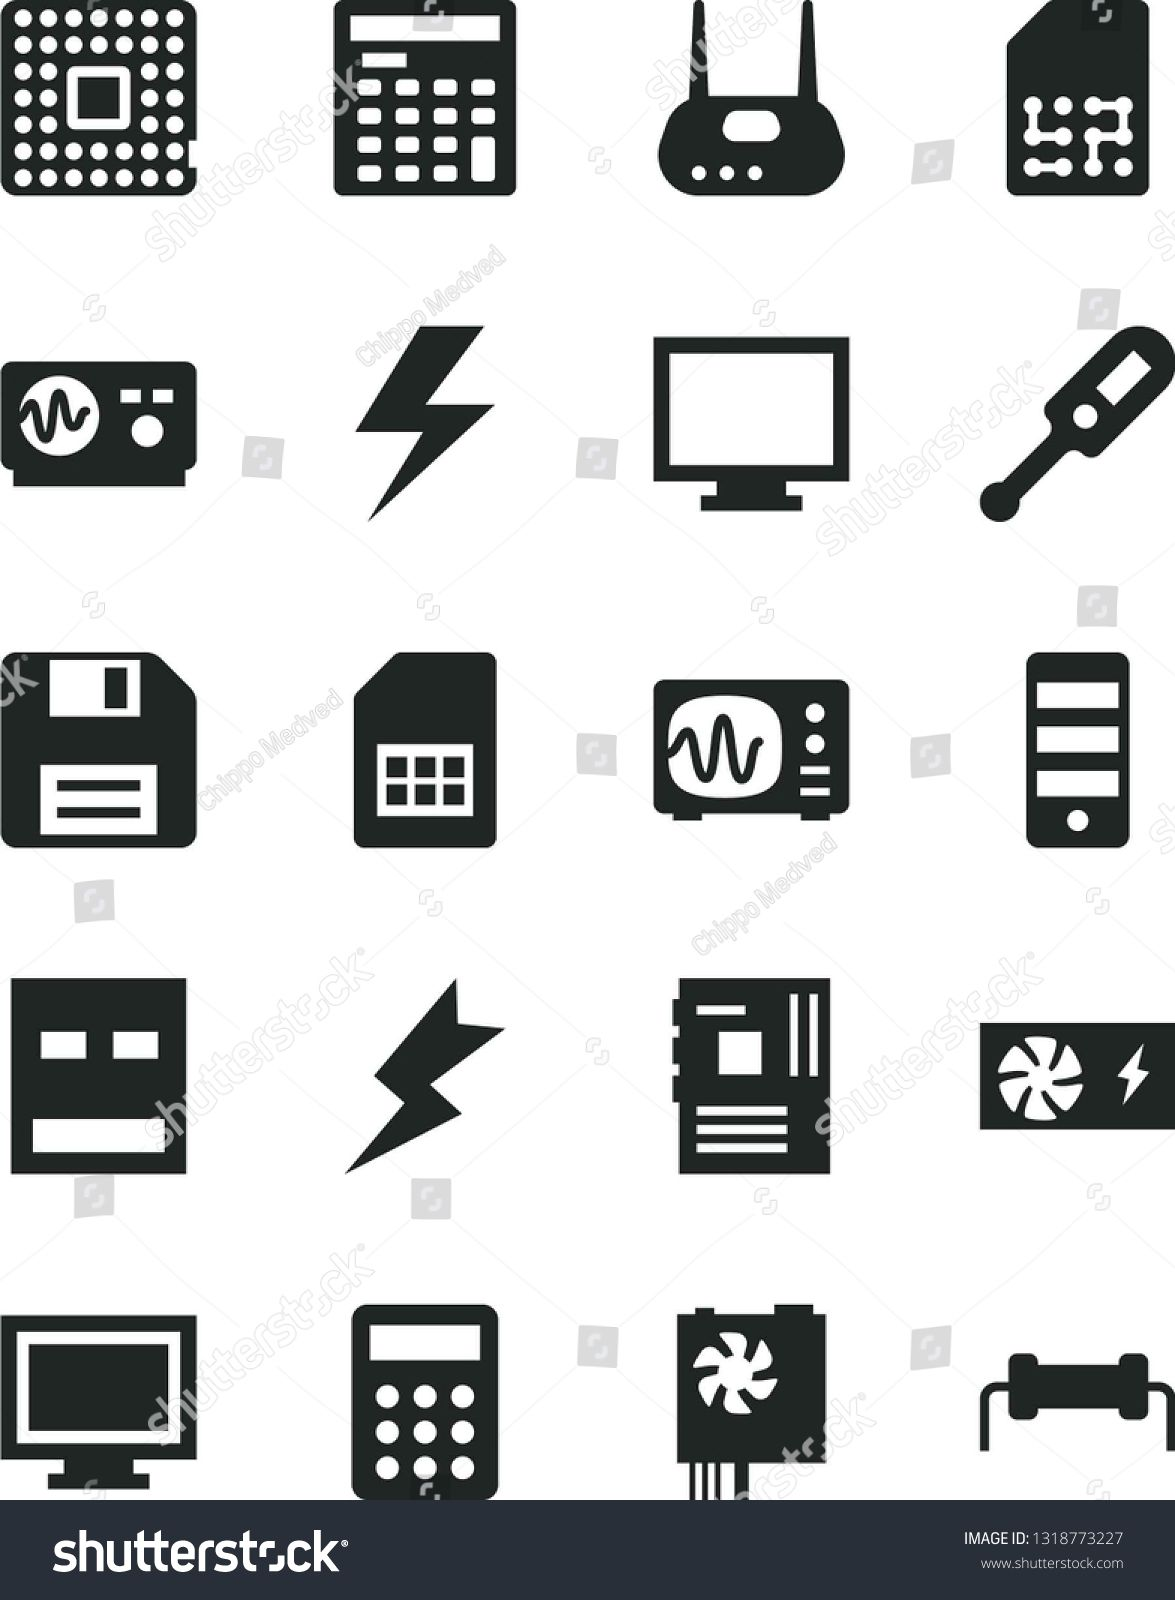 Solid Black Vector Icon Set lightning vector, floppy